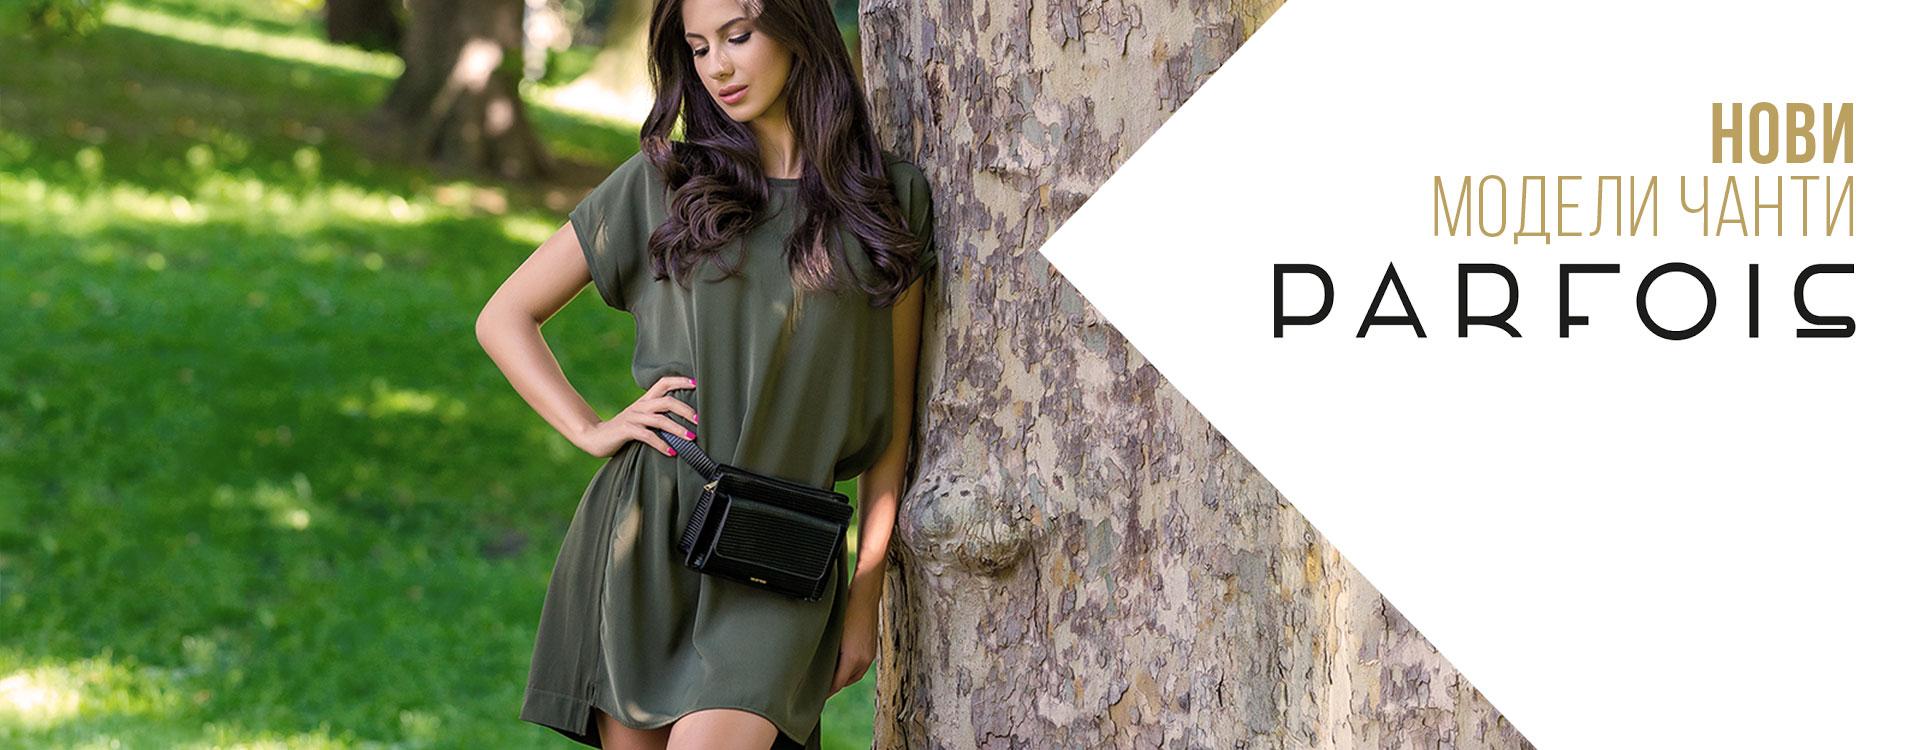 Нови модели чанти и дамски дрехи на склад